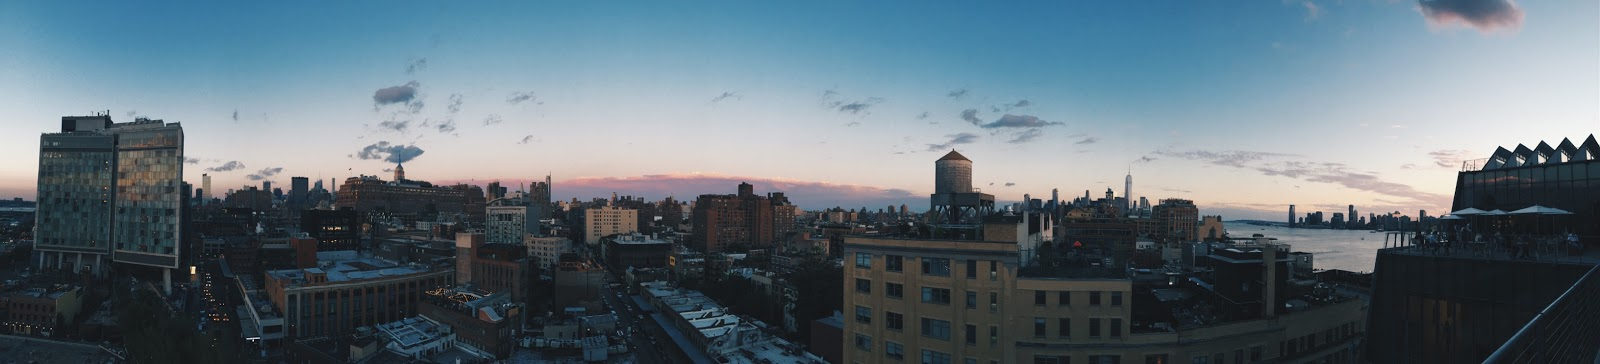 NYC21.jpg